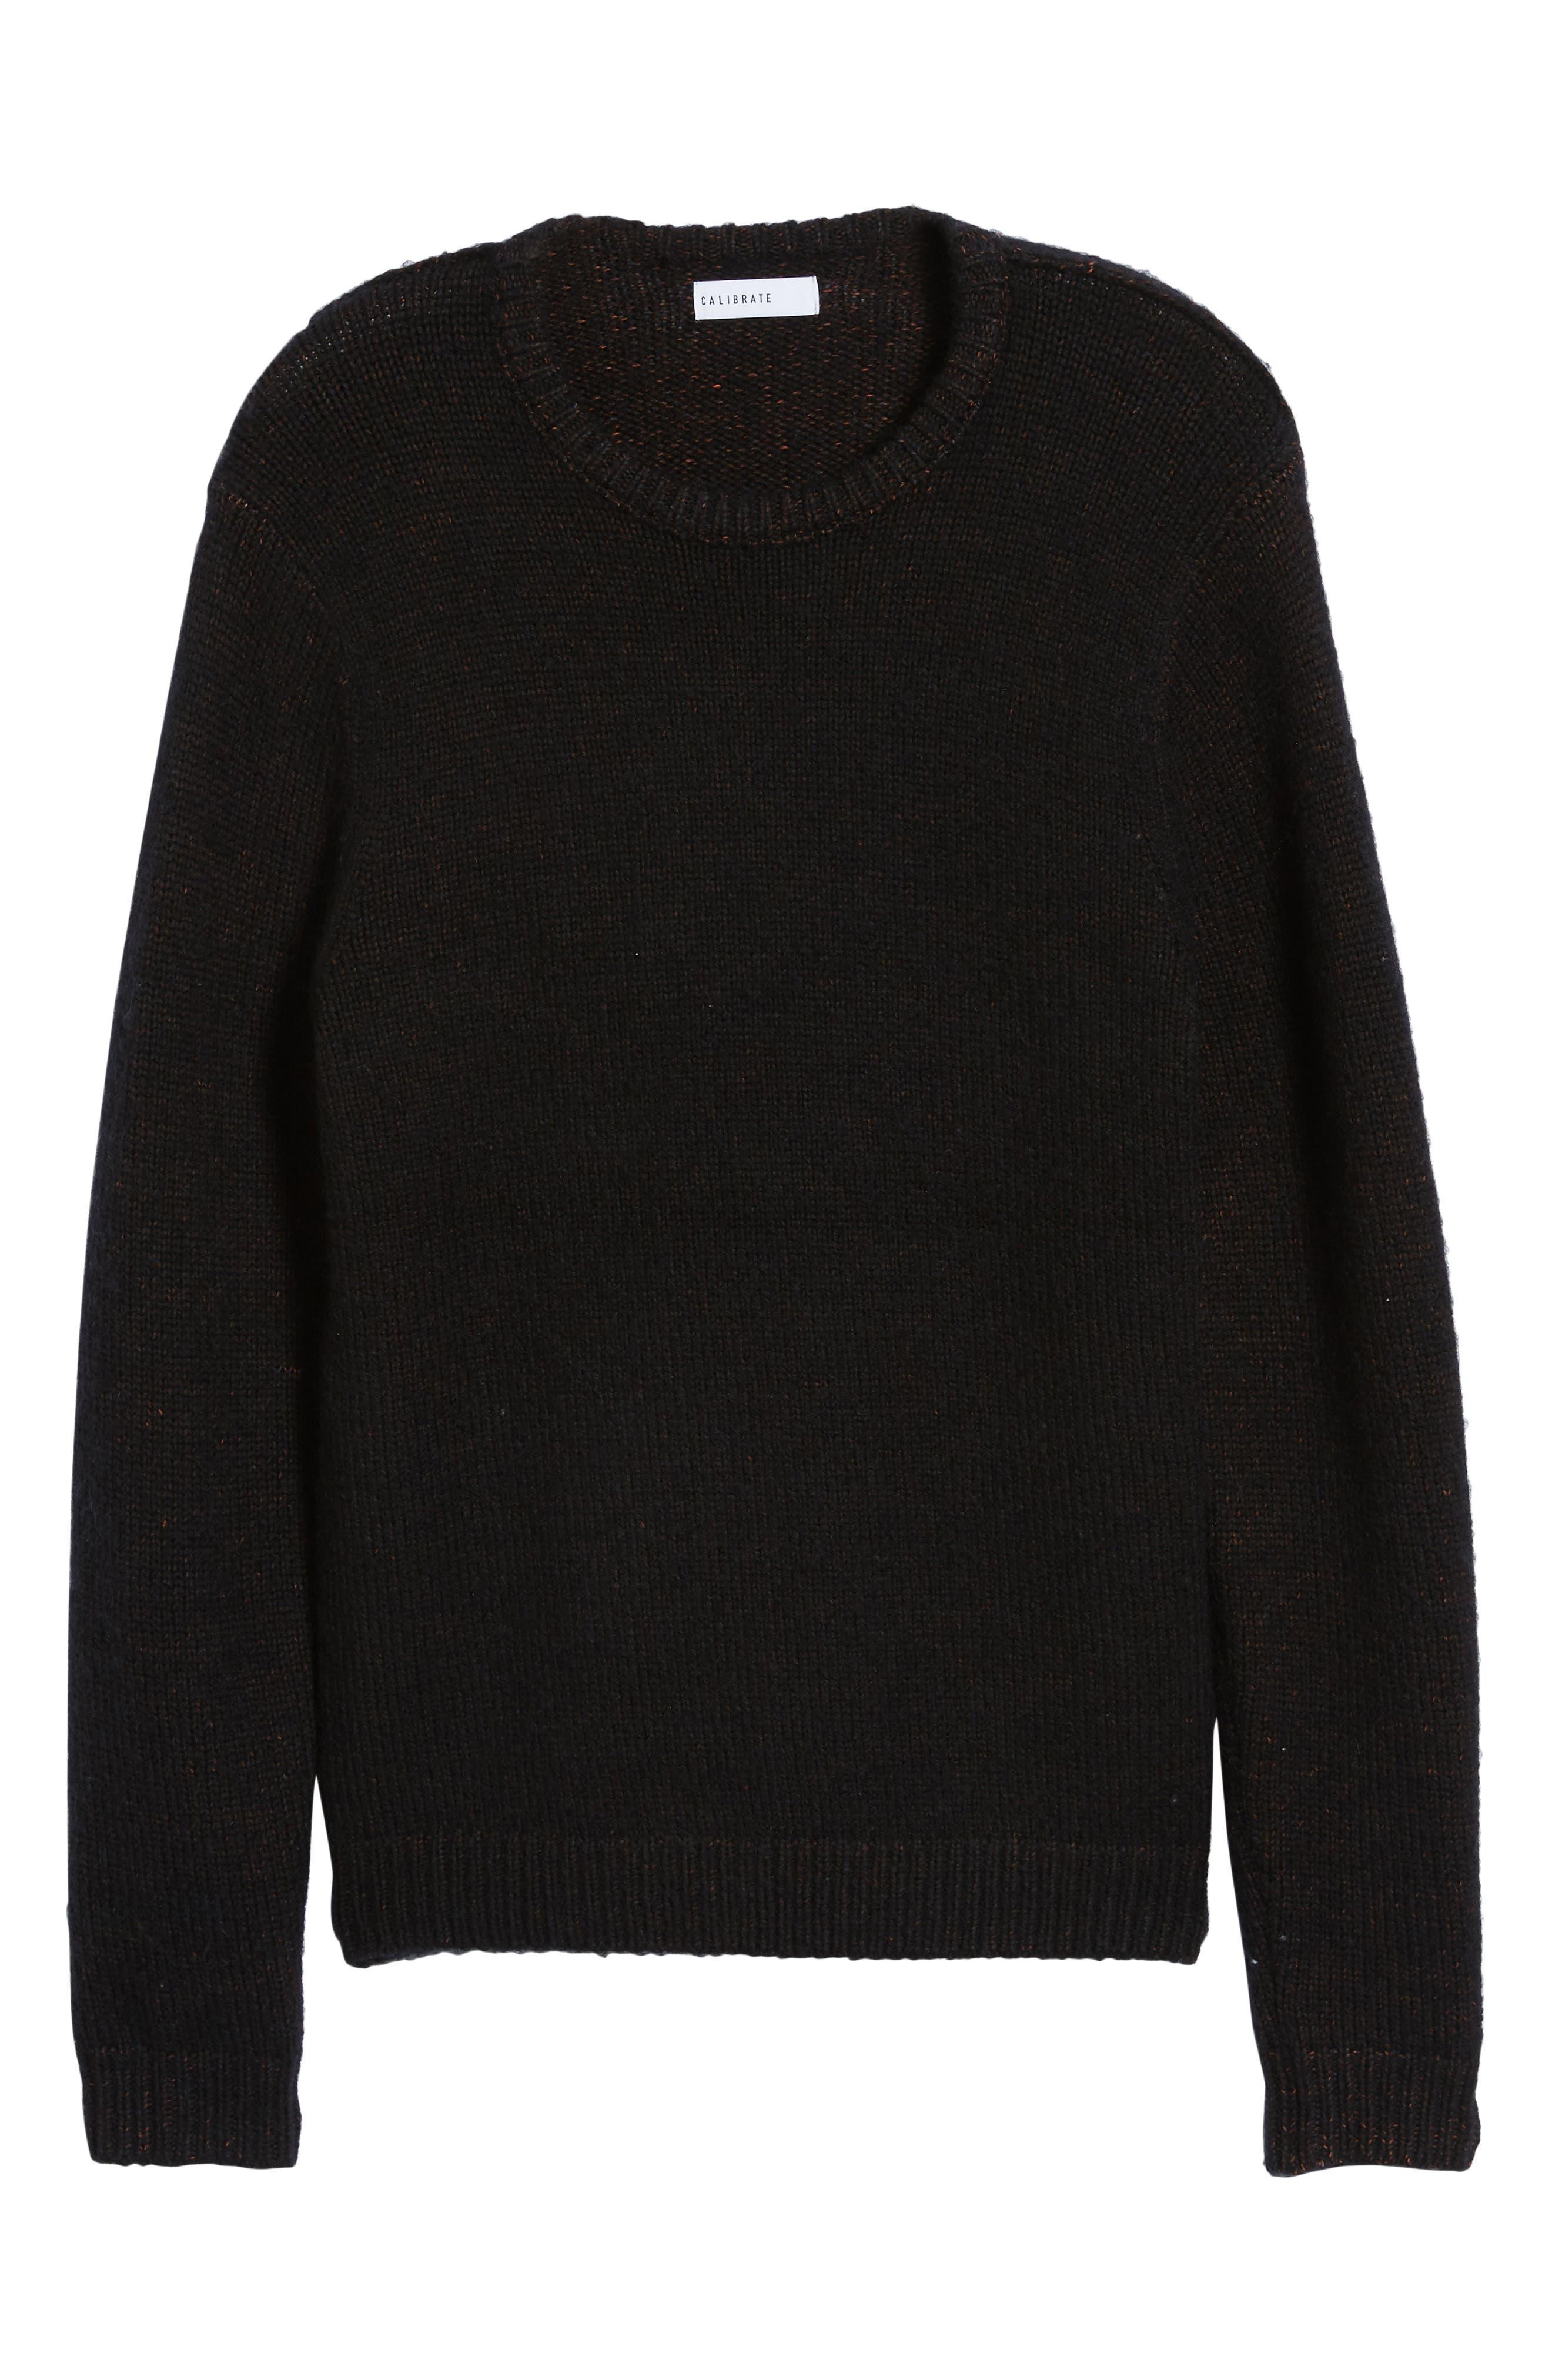 Chunky Crewneck Sweater,                             Alternate thumbnail 6, color,                             BLACK CAVIAR TWIST